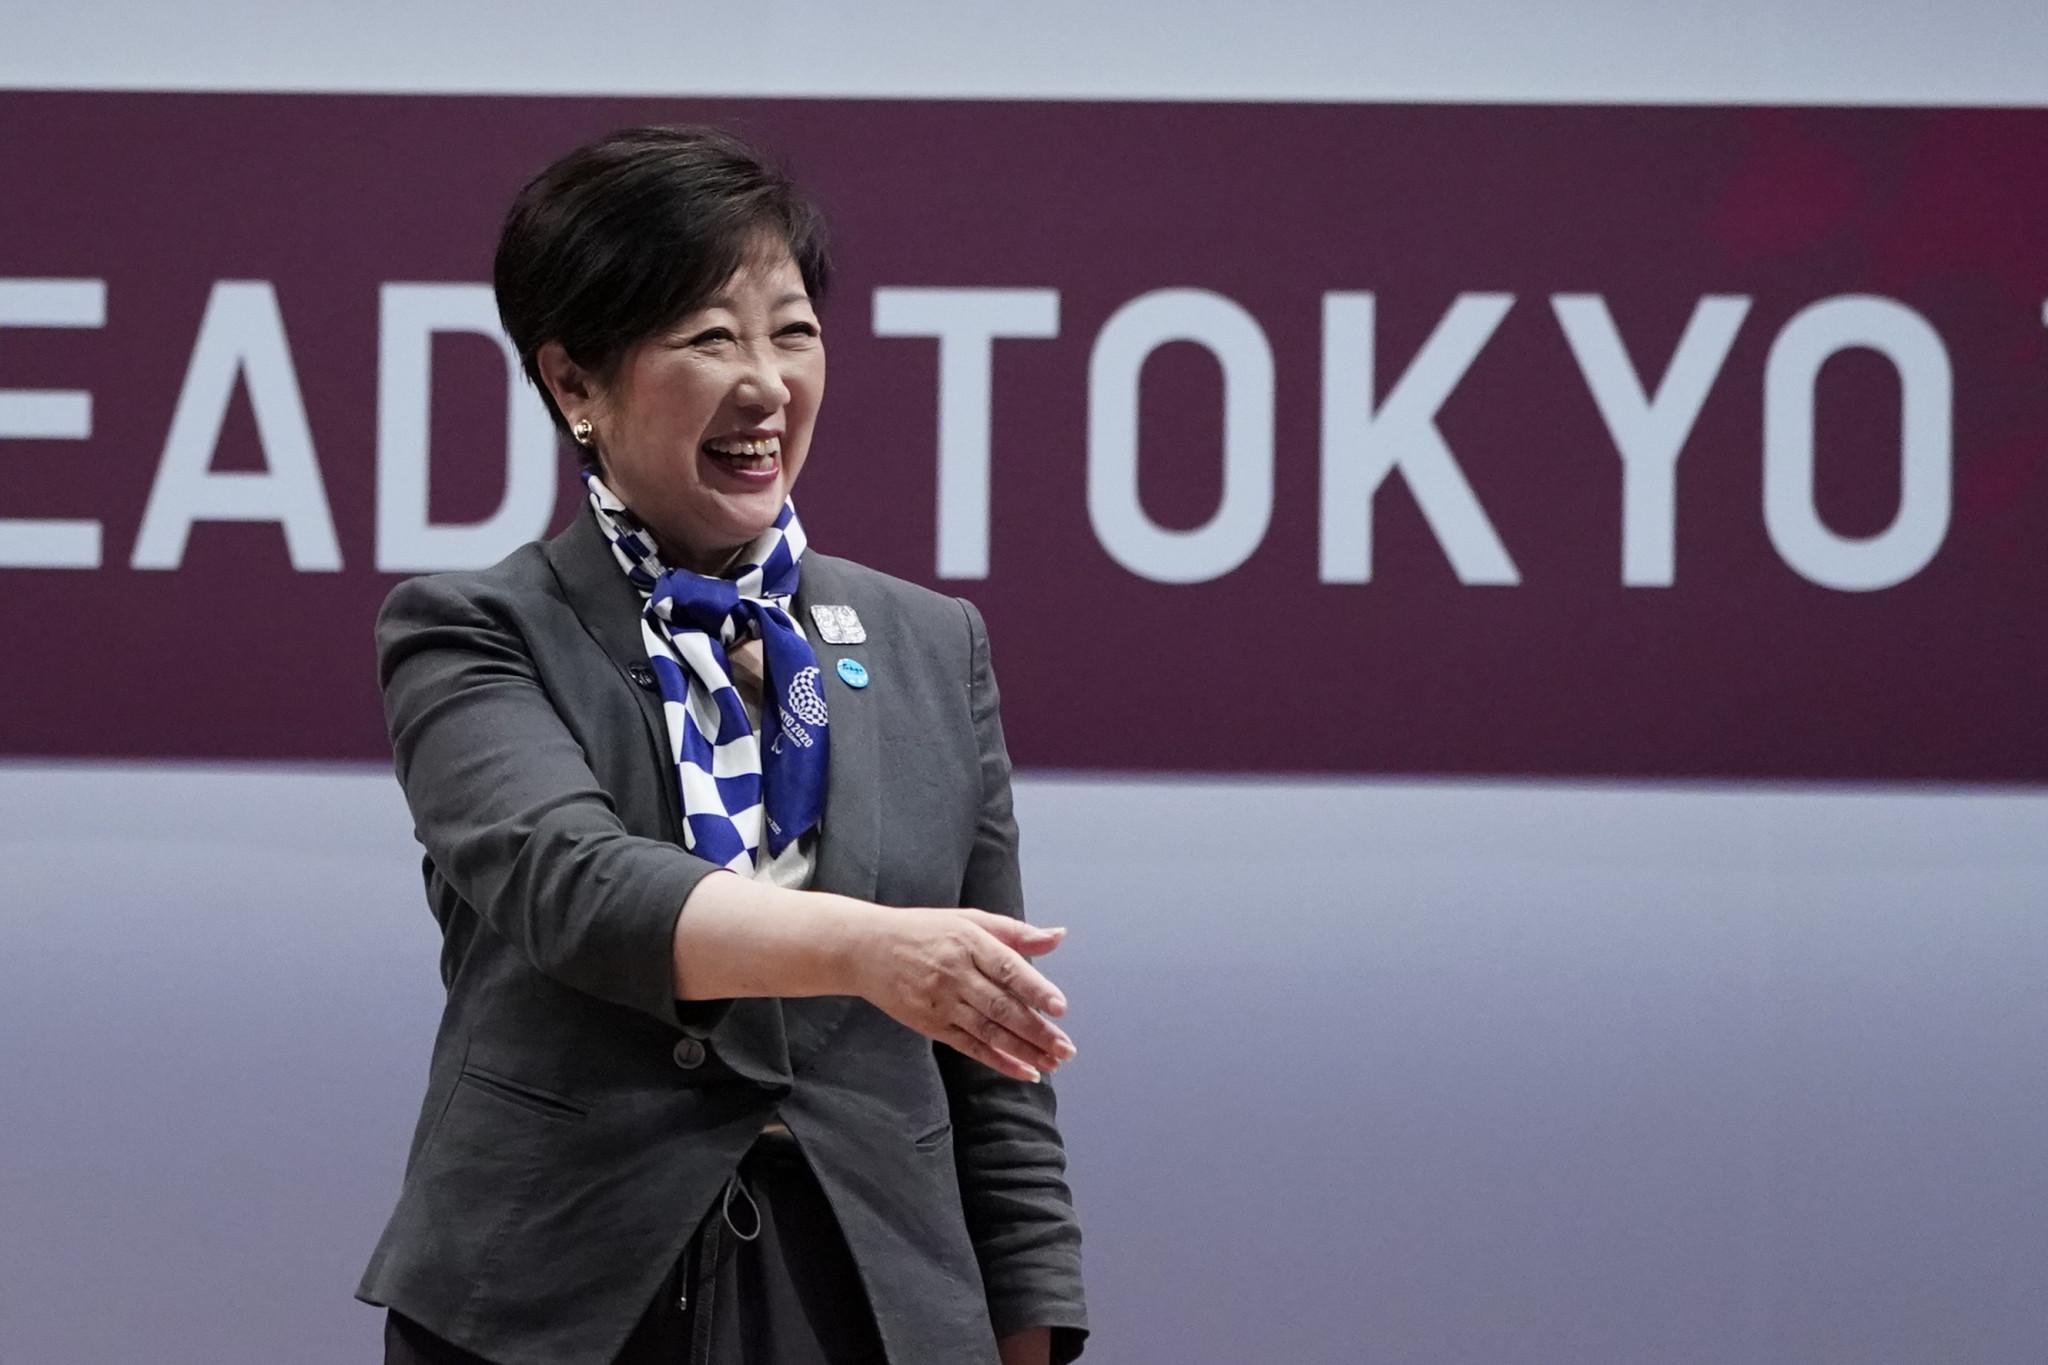 Tokyo Governor Yuriko Koike said she was